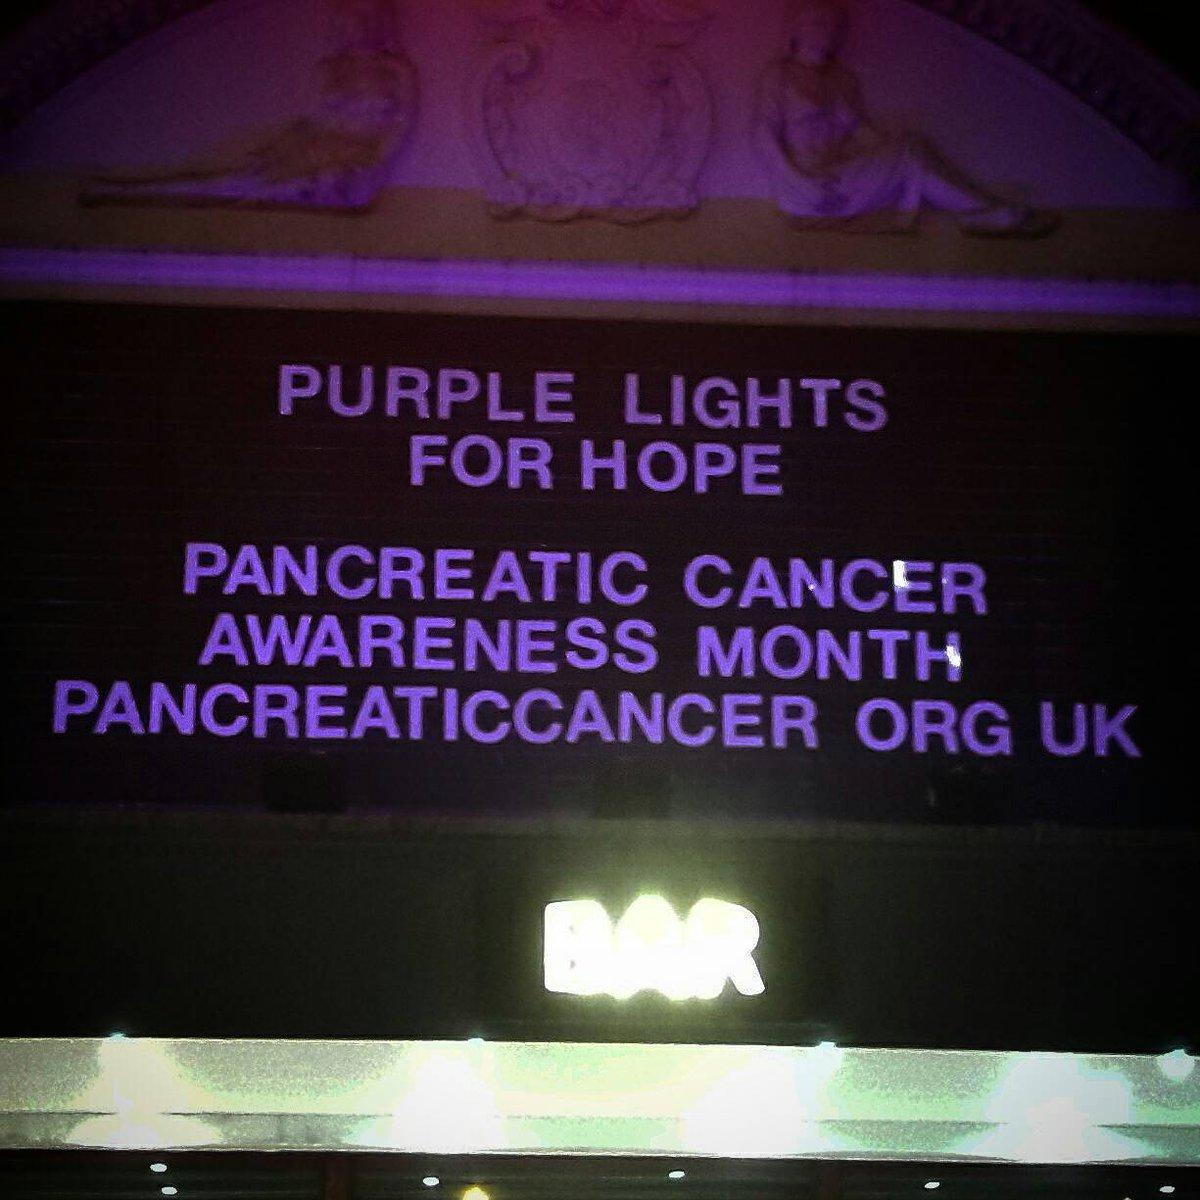 We've gone Purple to raise money for Pancreatic Cancer. Visit: https://t.co/8fzBkE5sQQ for more details. https://t.co/tvgp6y94Ij